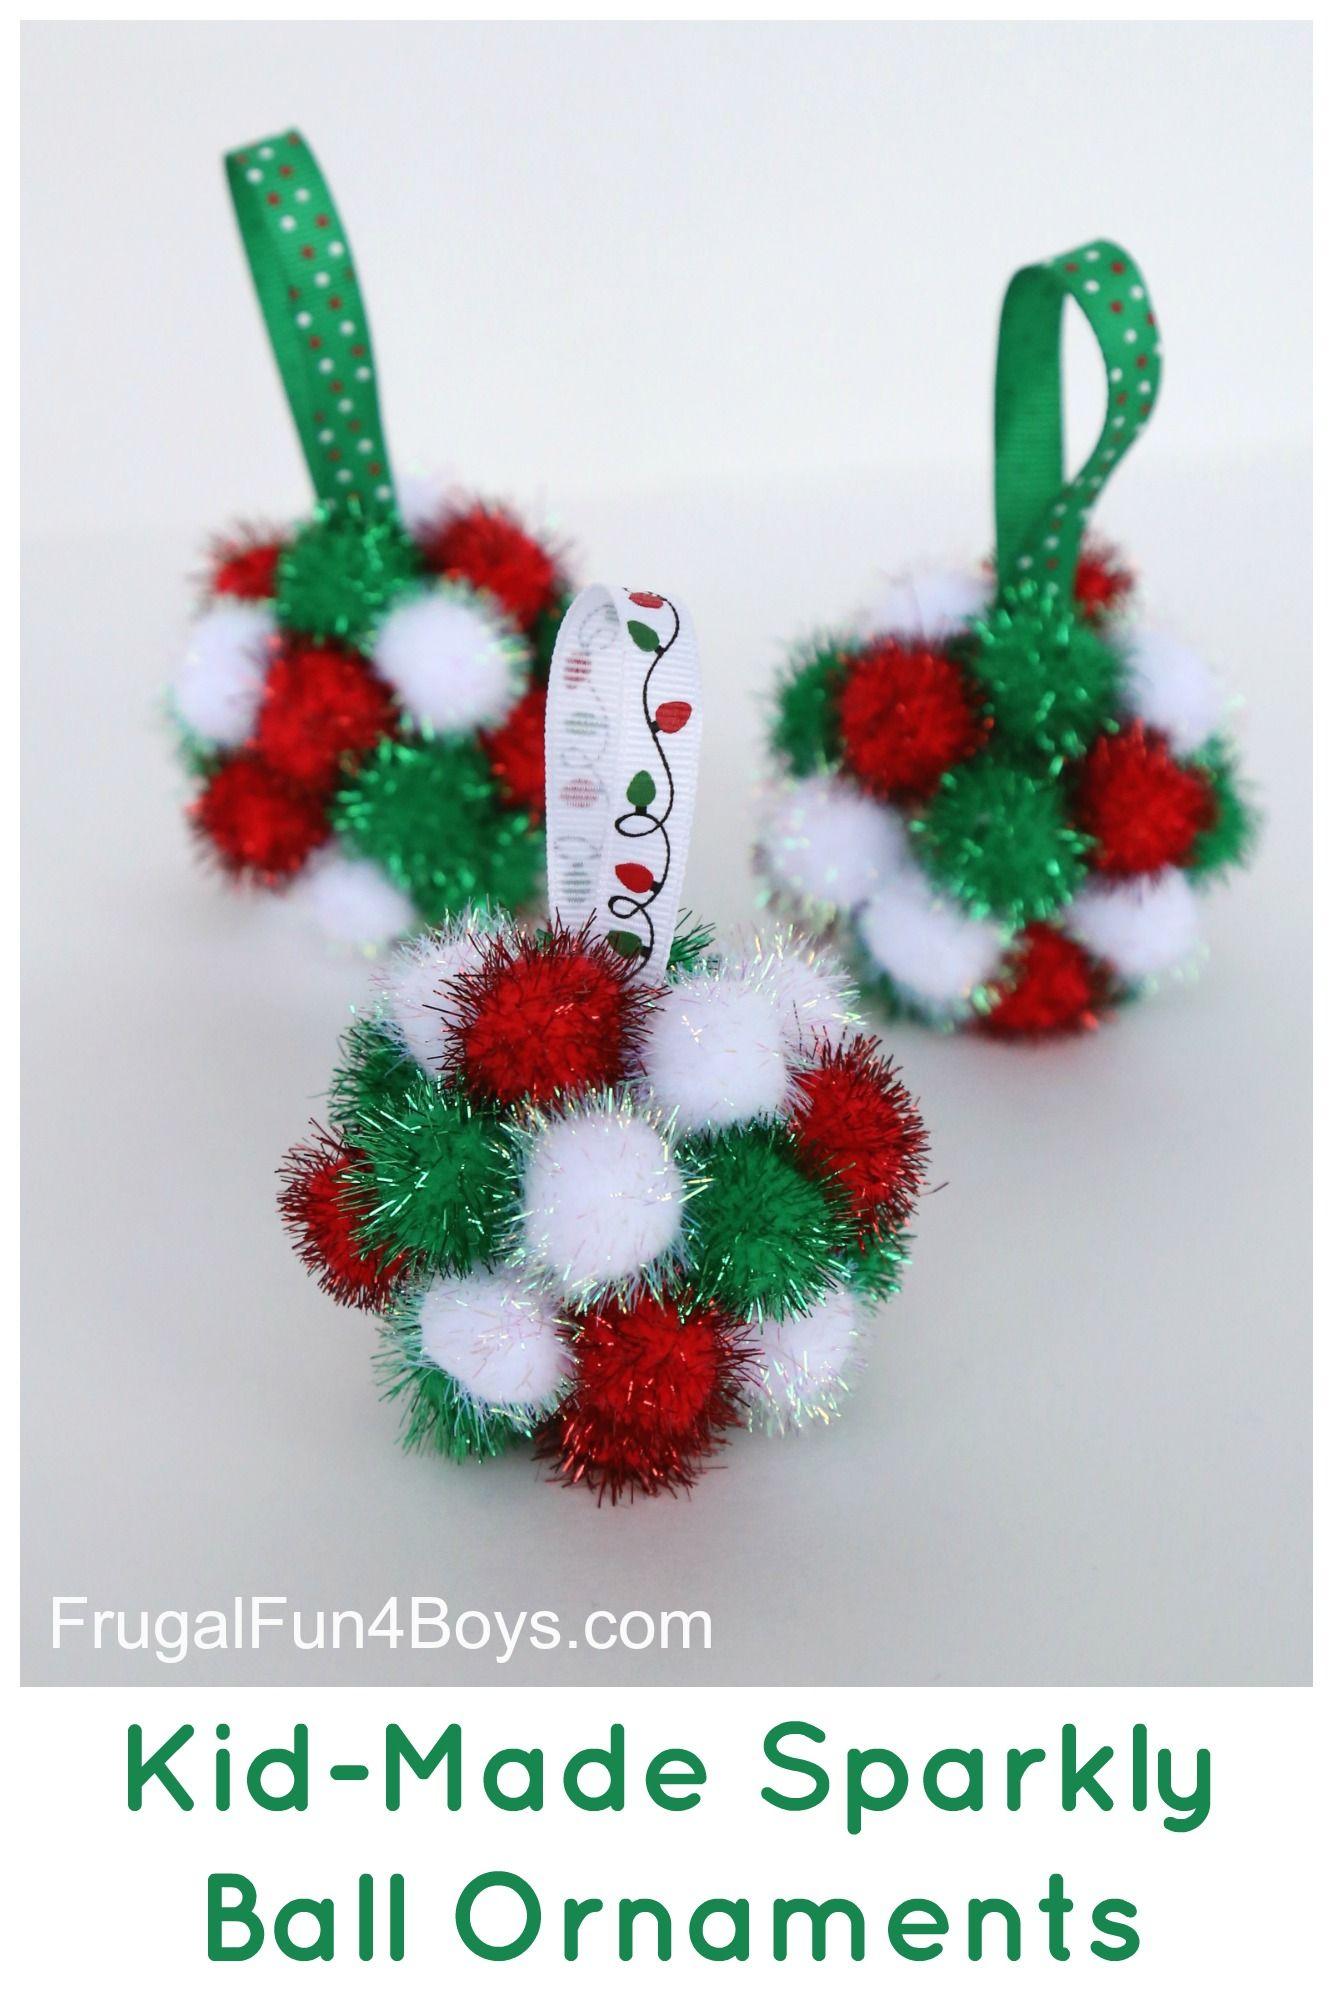 Artibetter 3M Glitter Pom Poms Balls Christmas Pom Poms Ribbon Glitter Pompoms para Guirnalda de /Árbol de Navidad Decoraci/ón de Fiesta Cinta para Envolver Regalos